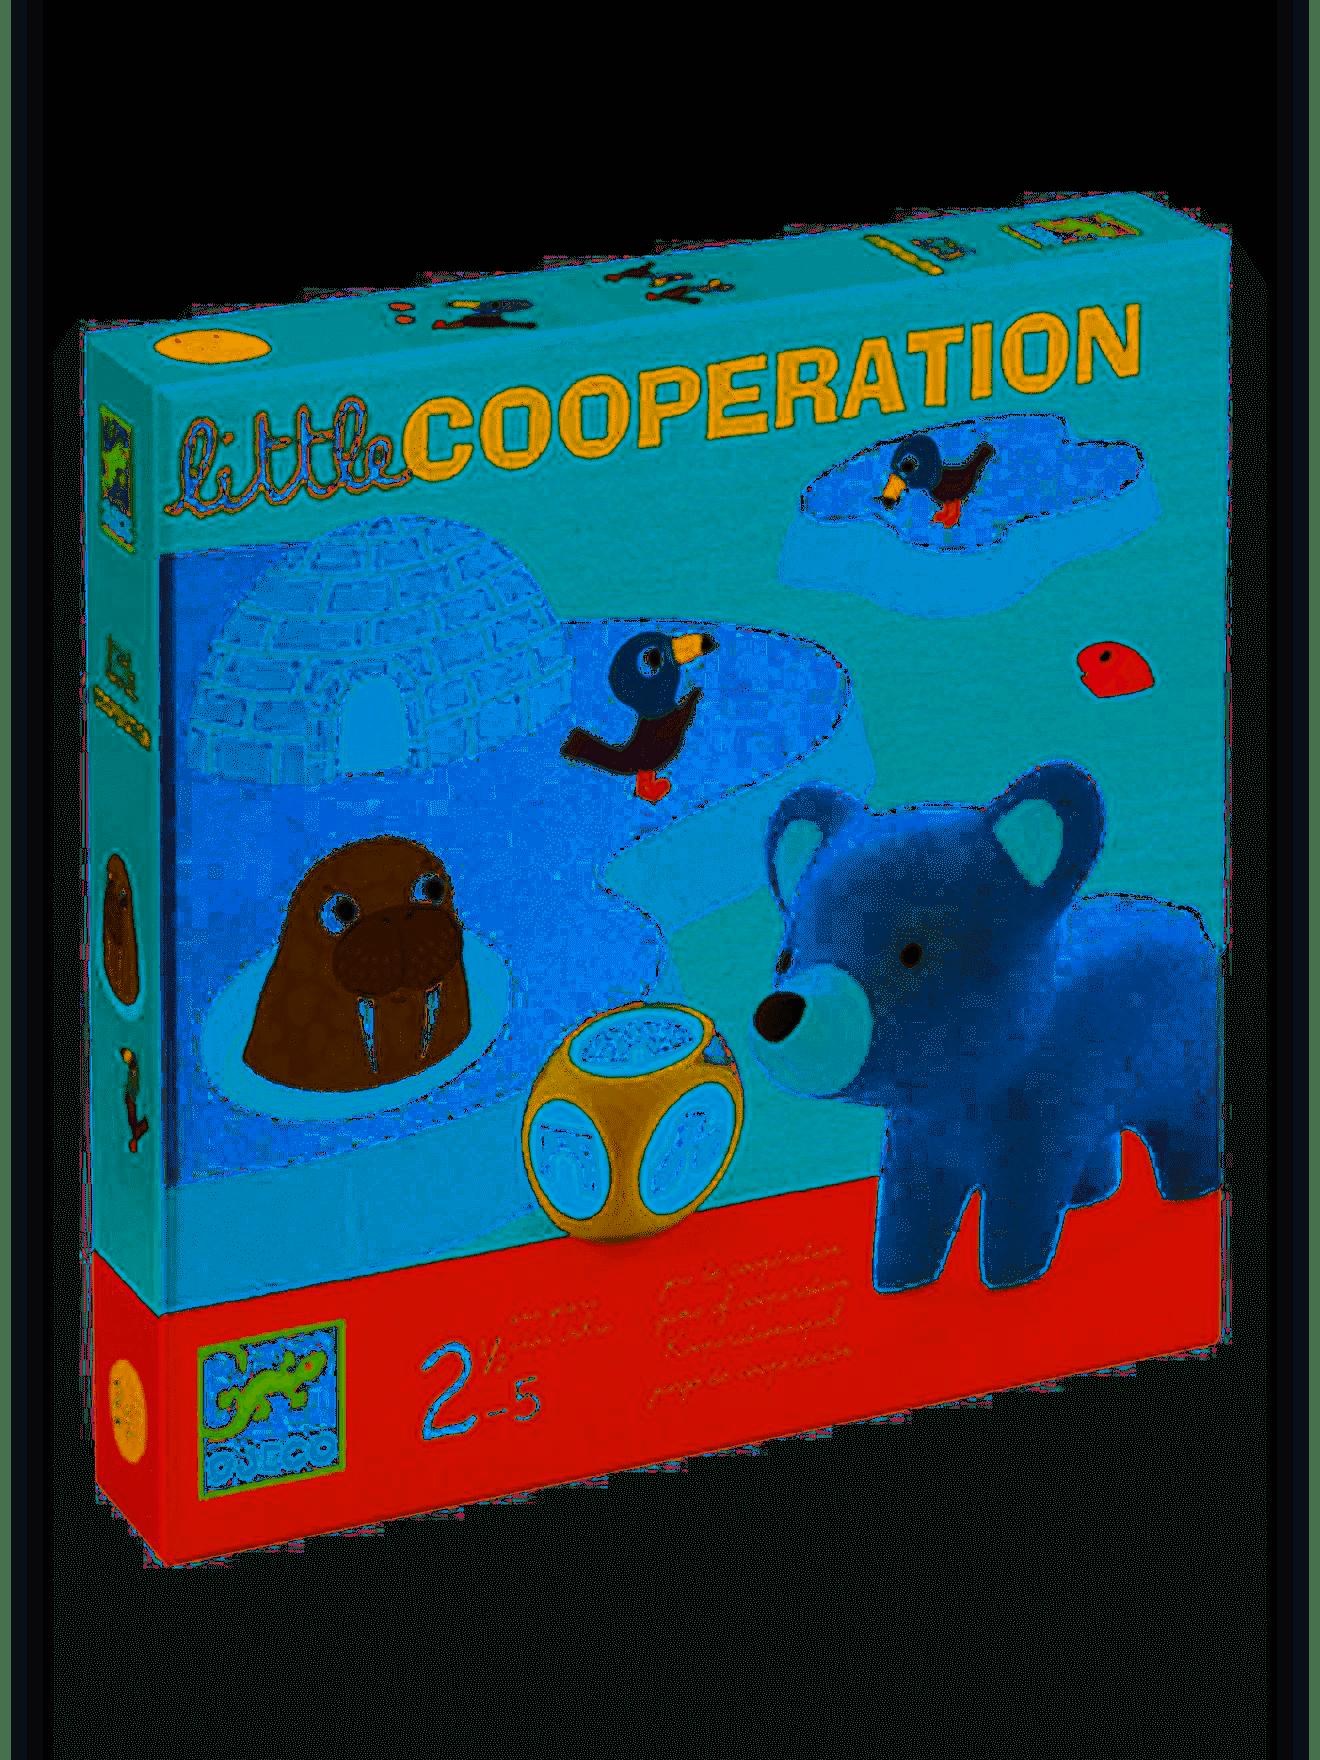 Little Coopération - Ref 02N03P